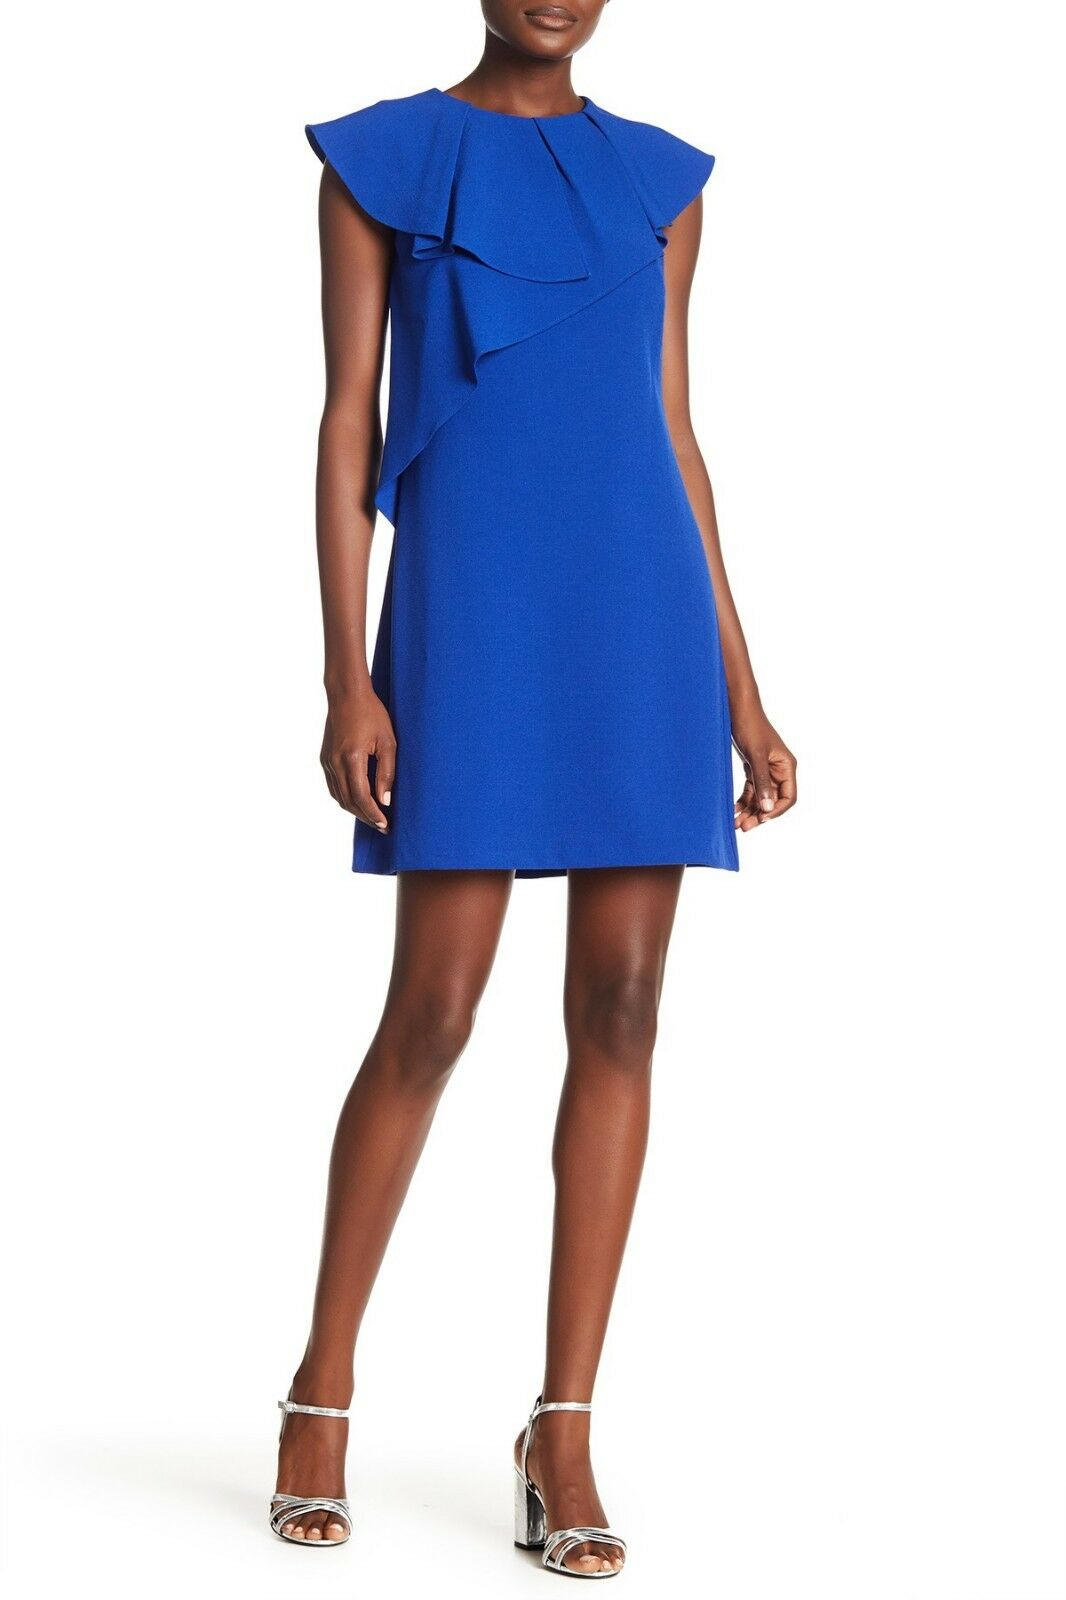 Eliza J Ruffle Cap Sleeves Shift Dress Royal bluee Size 14